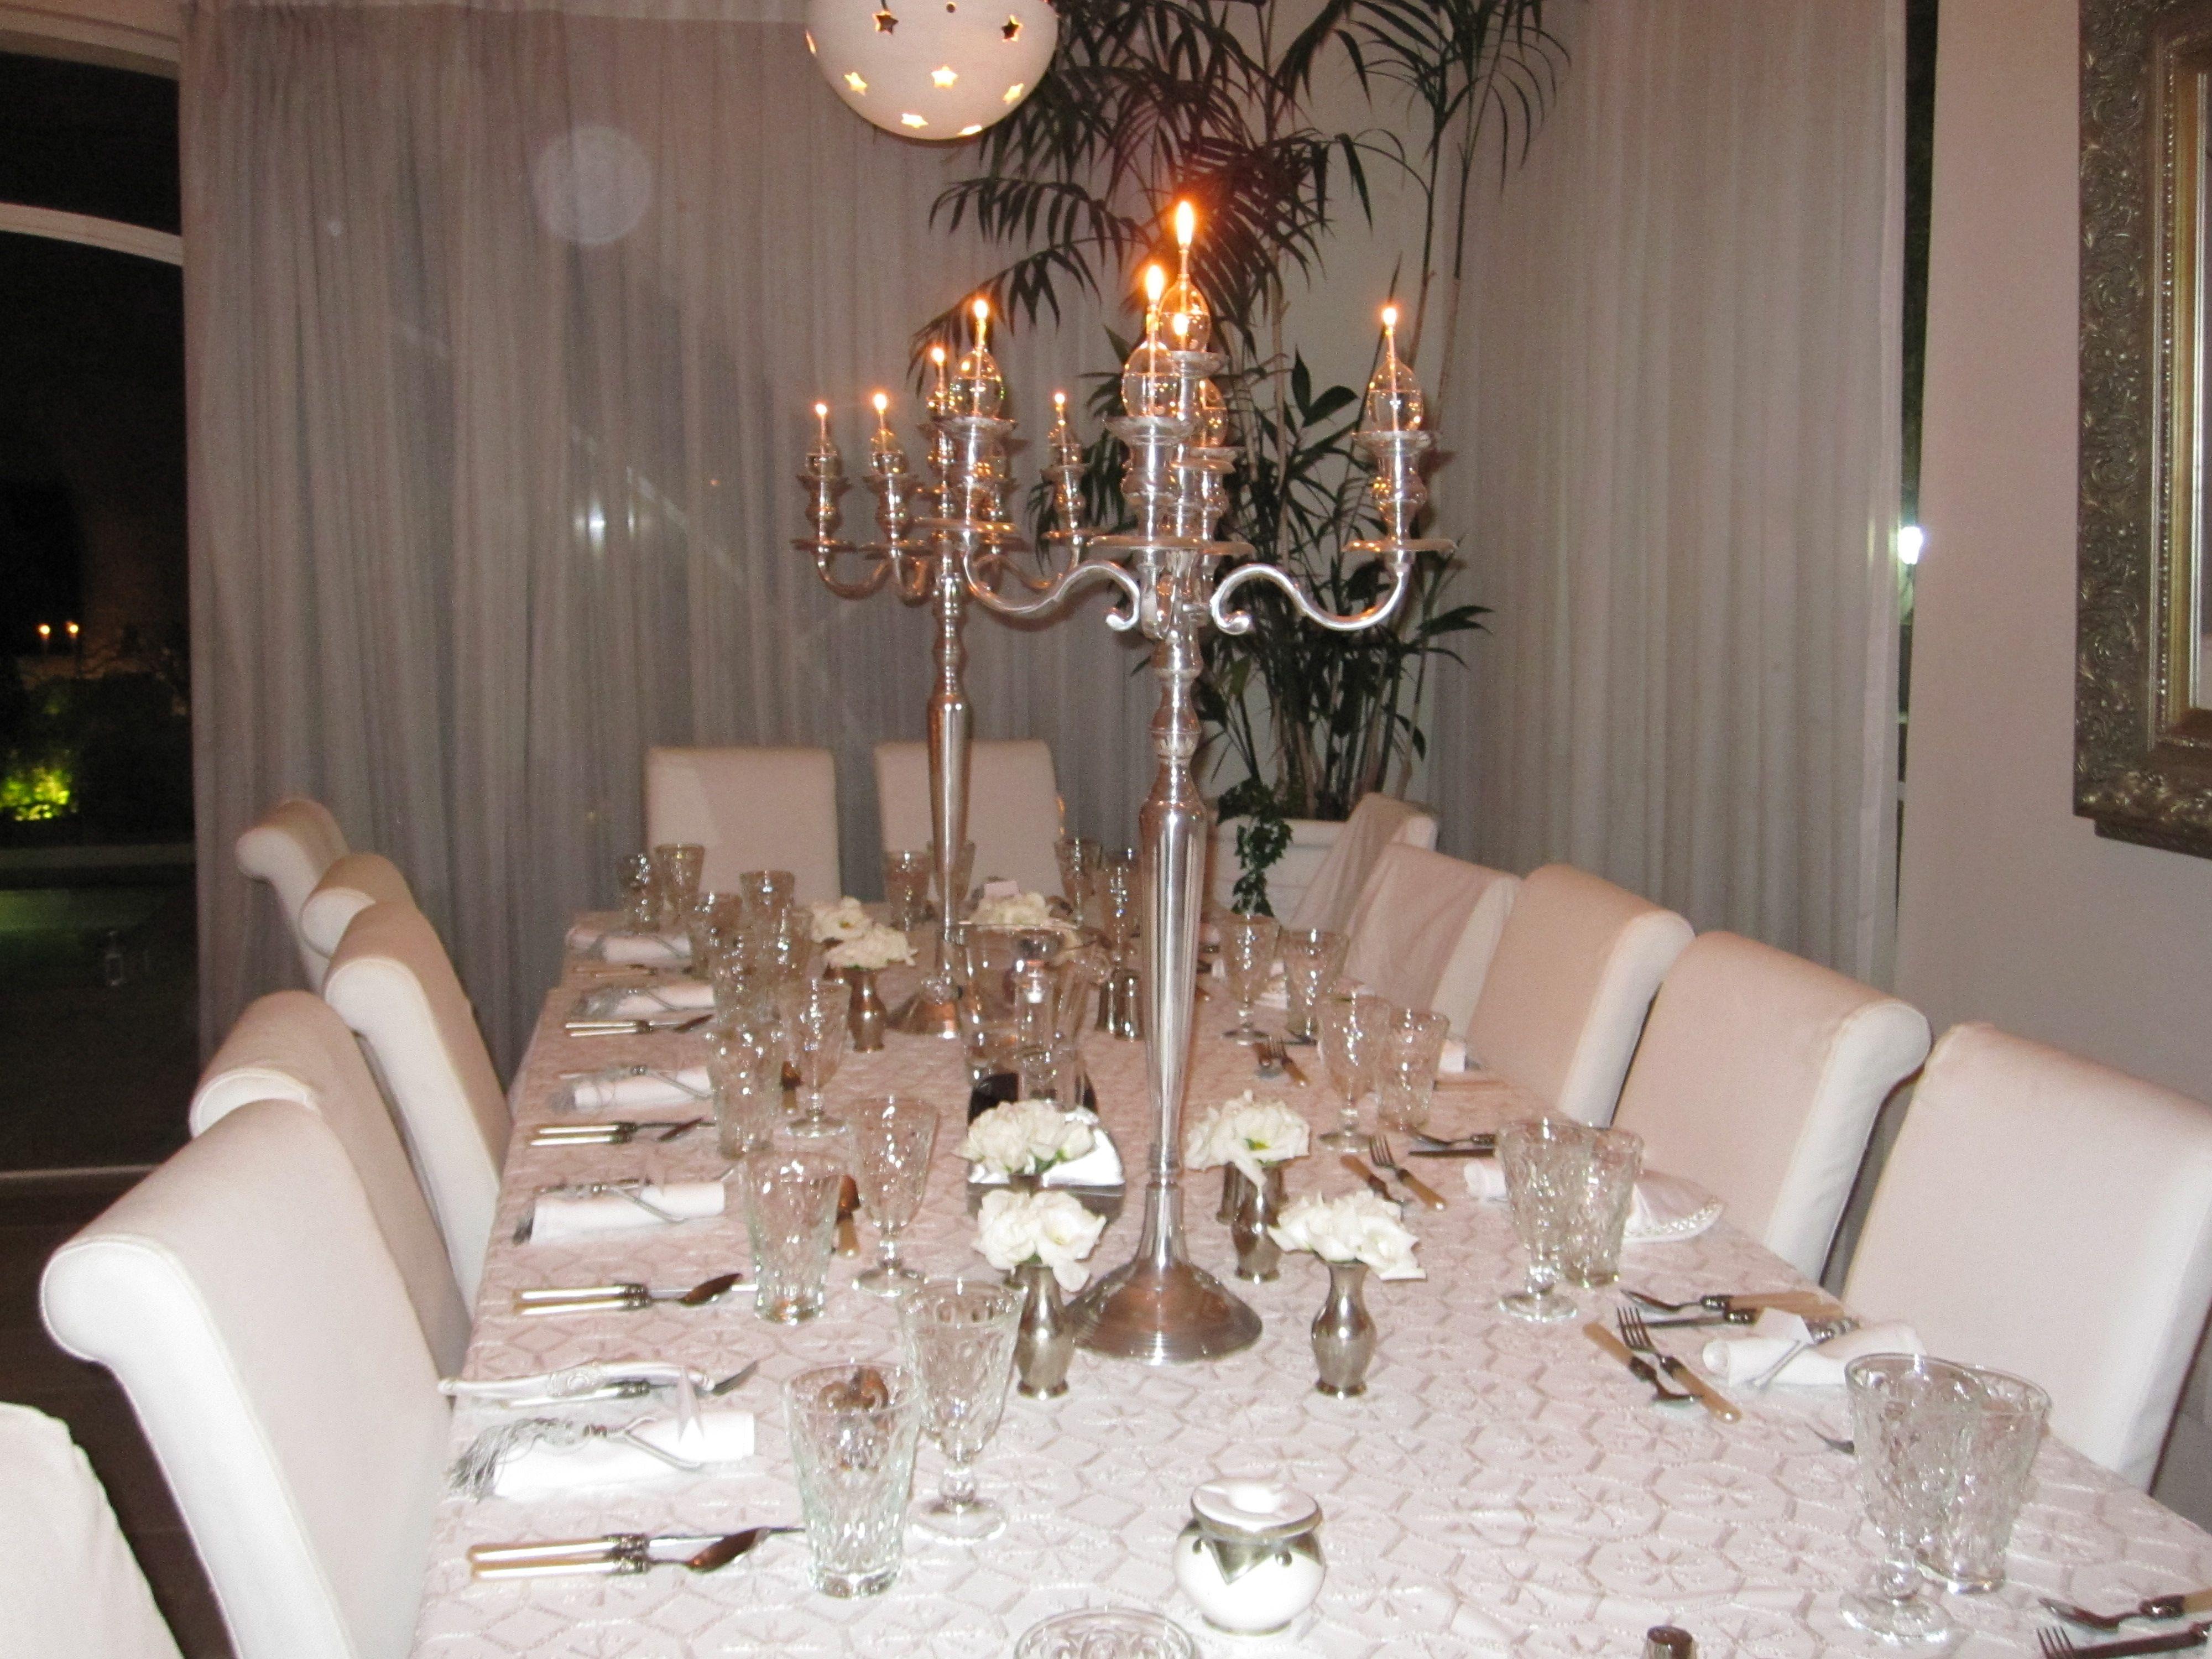 Shabbat Dinner table | The Creative Table | Pinterest | Shabbat ...